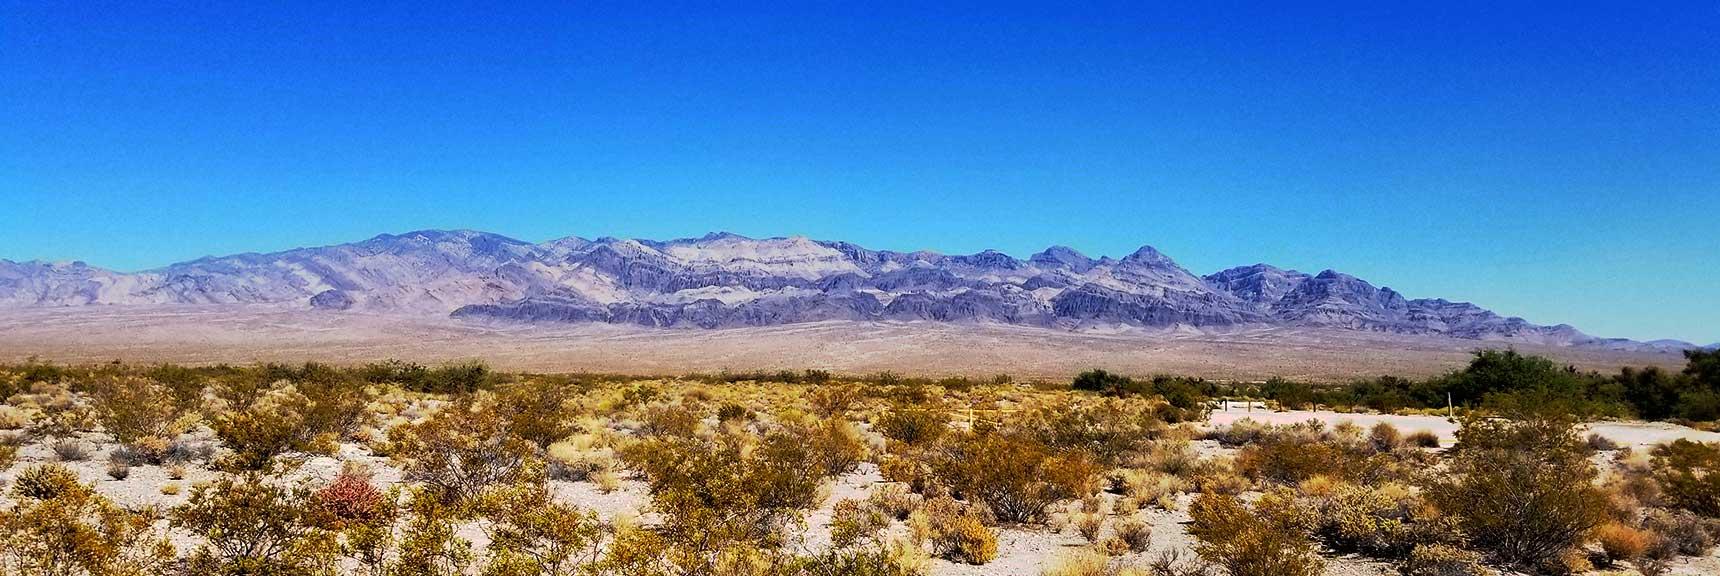 Sheep Range Viewed from I-95, Nevada